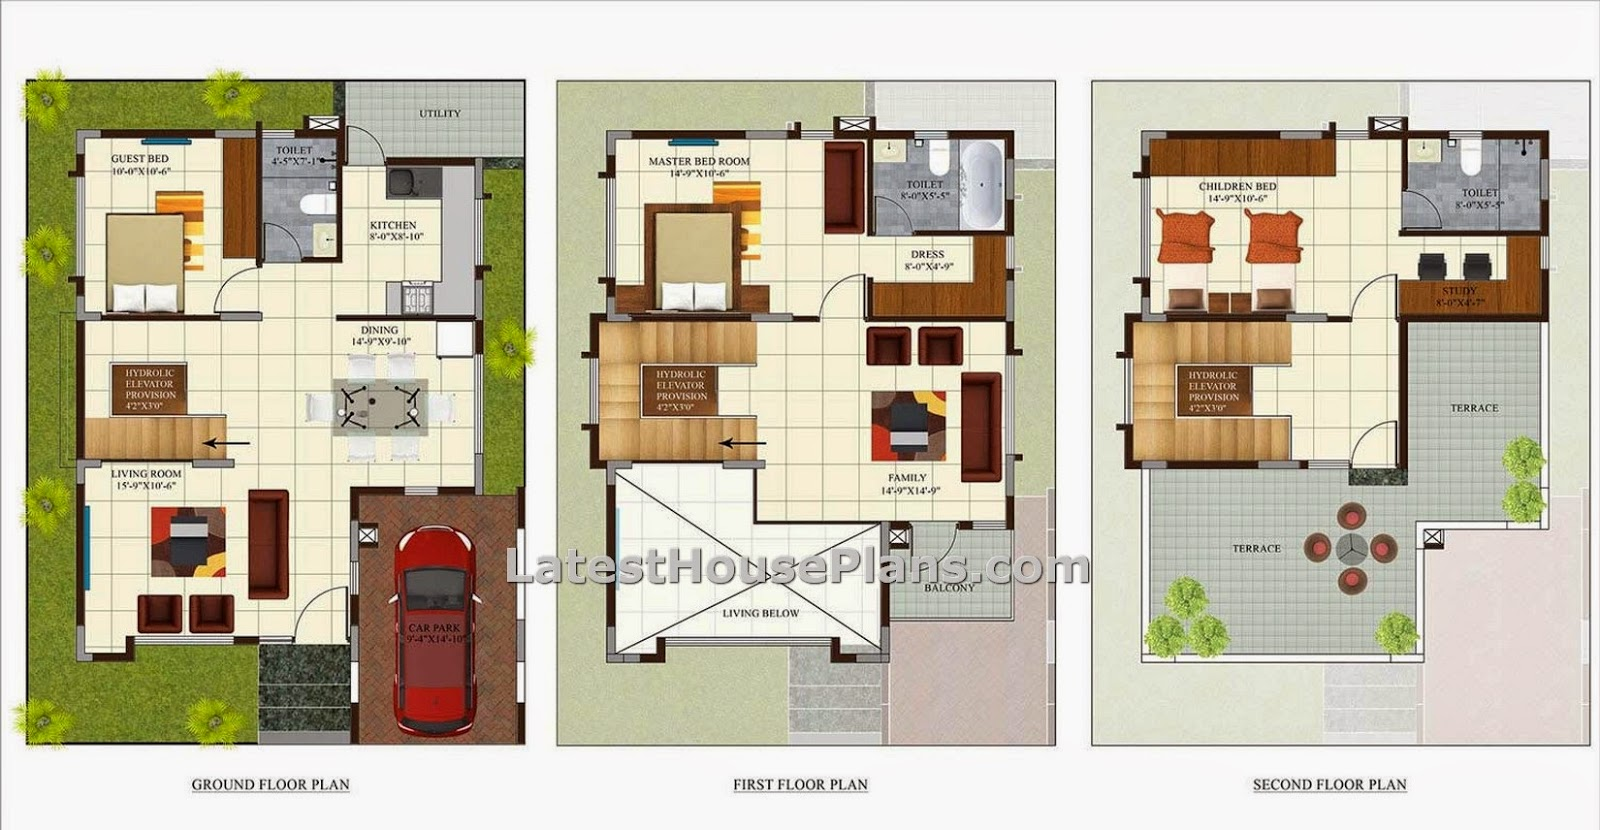 Three bedroom luxury villa house plan in area of 1850 sq ft